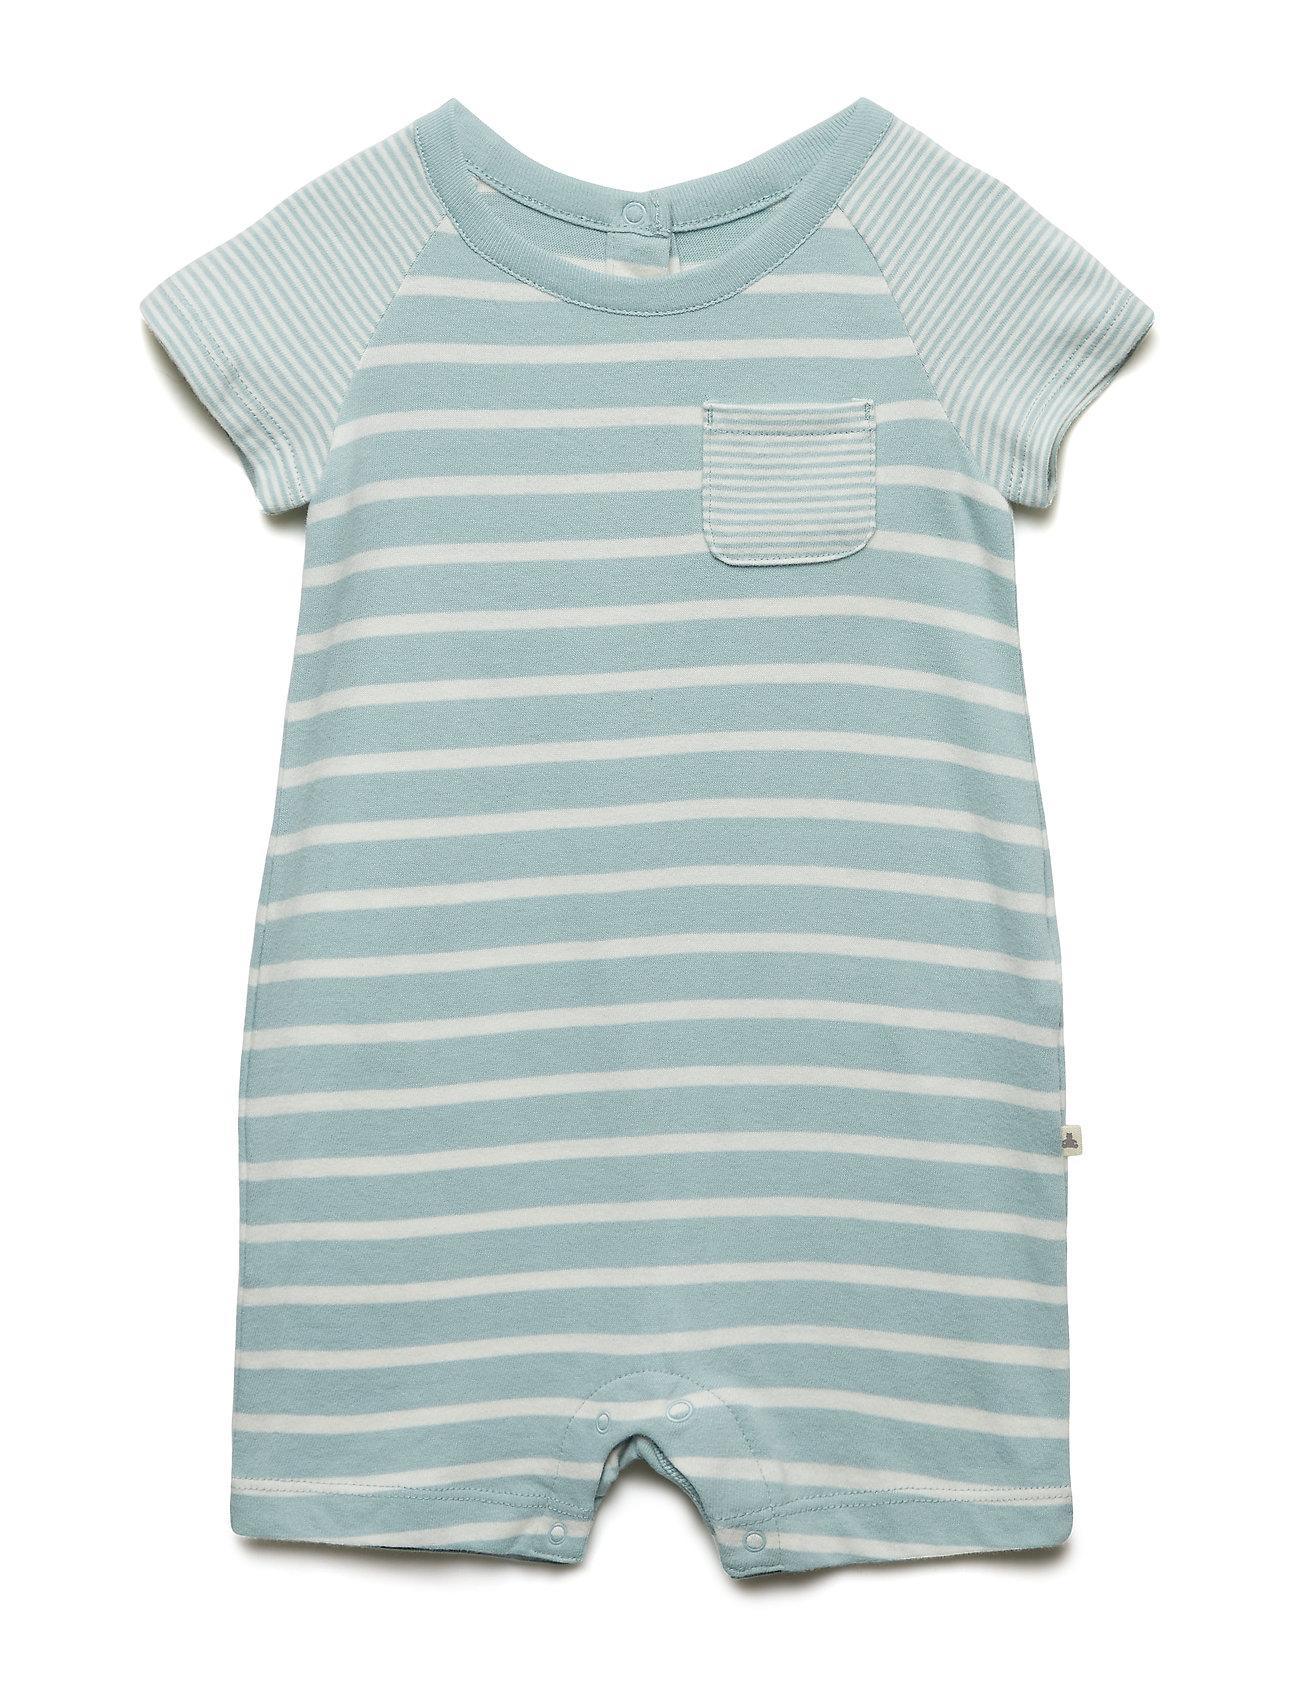 GAP Baby Organic Cotton Stripe Shorty One-Piece - FRESH WATER 917